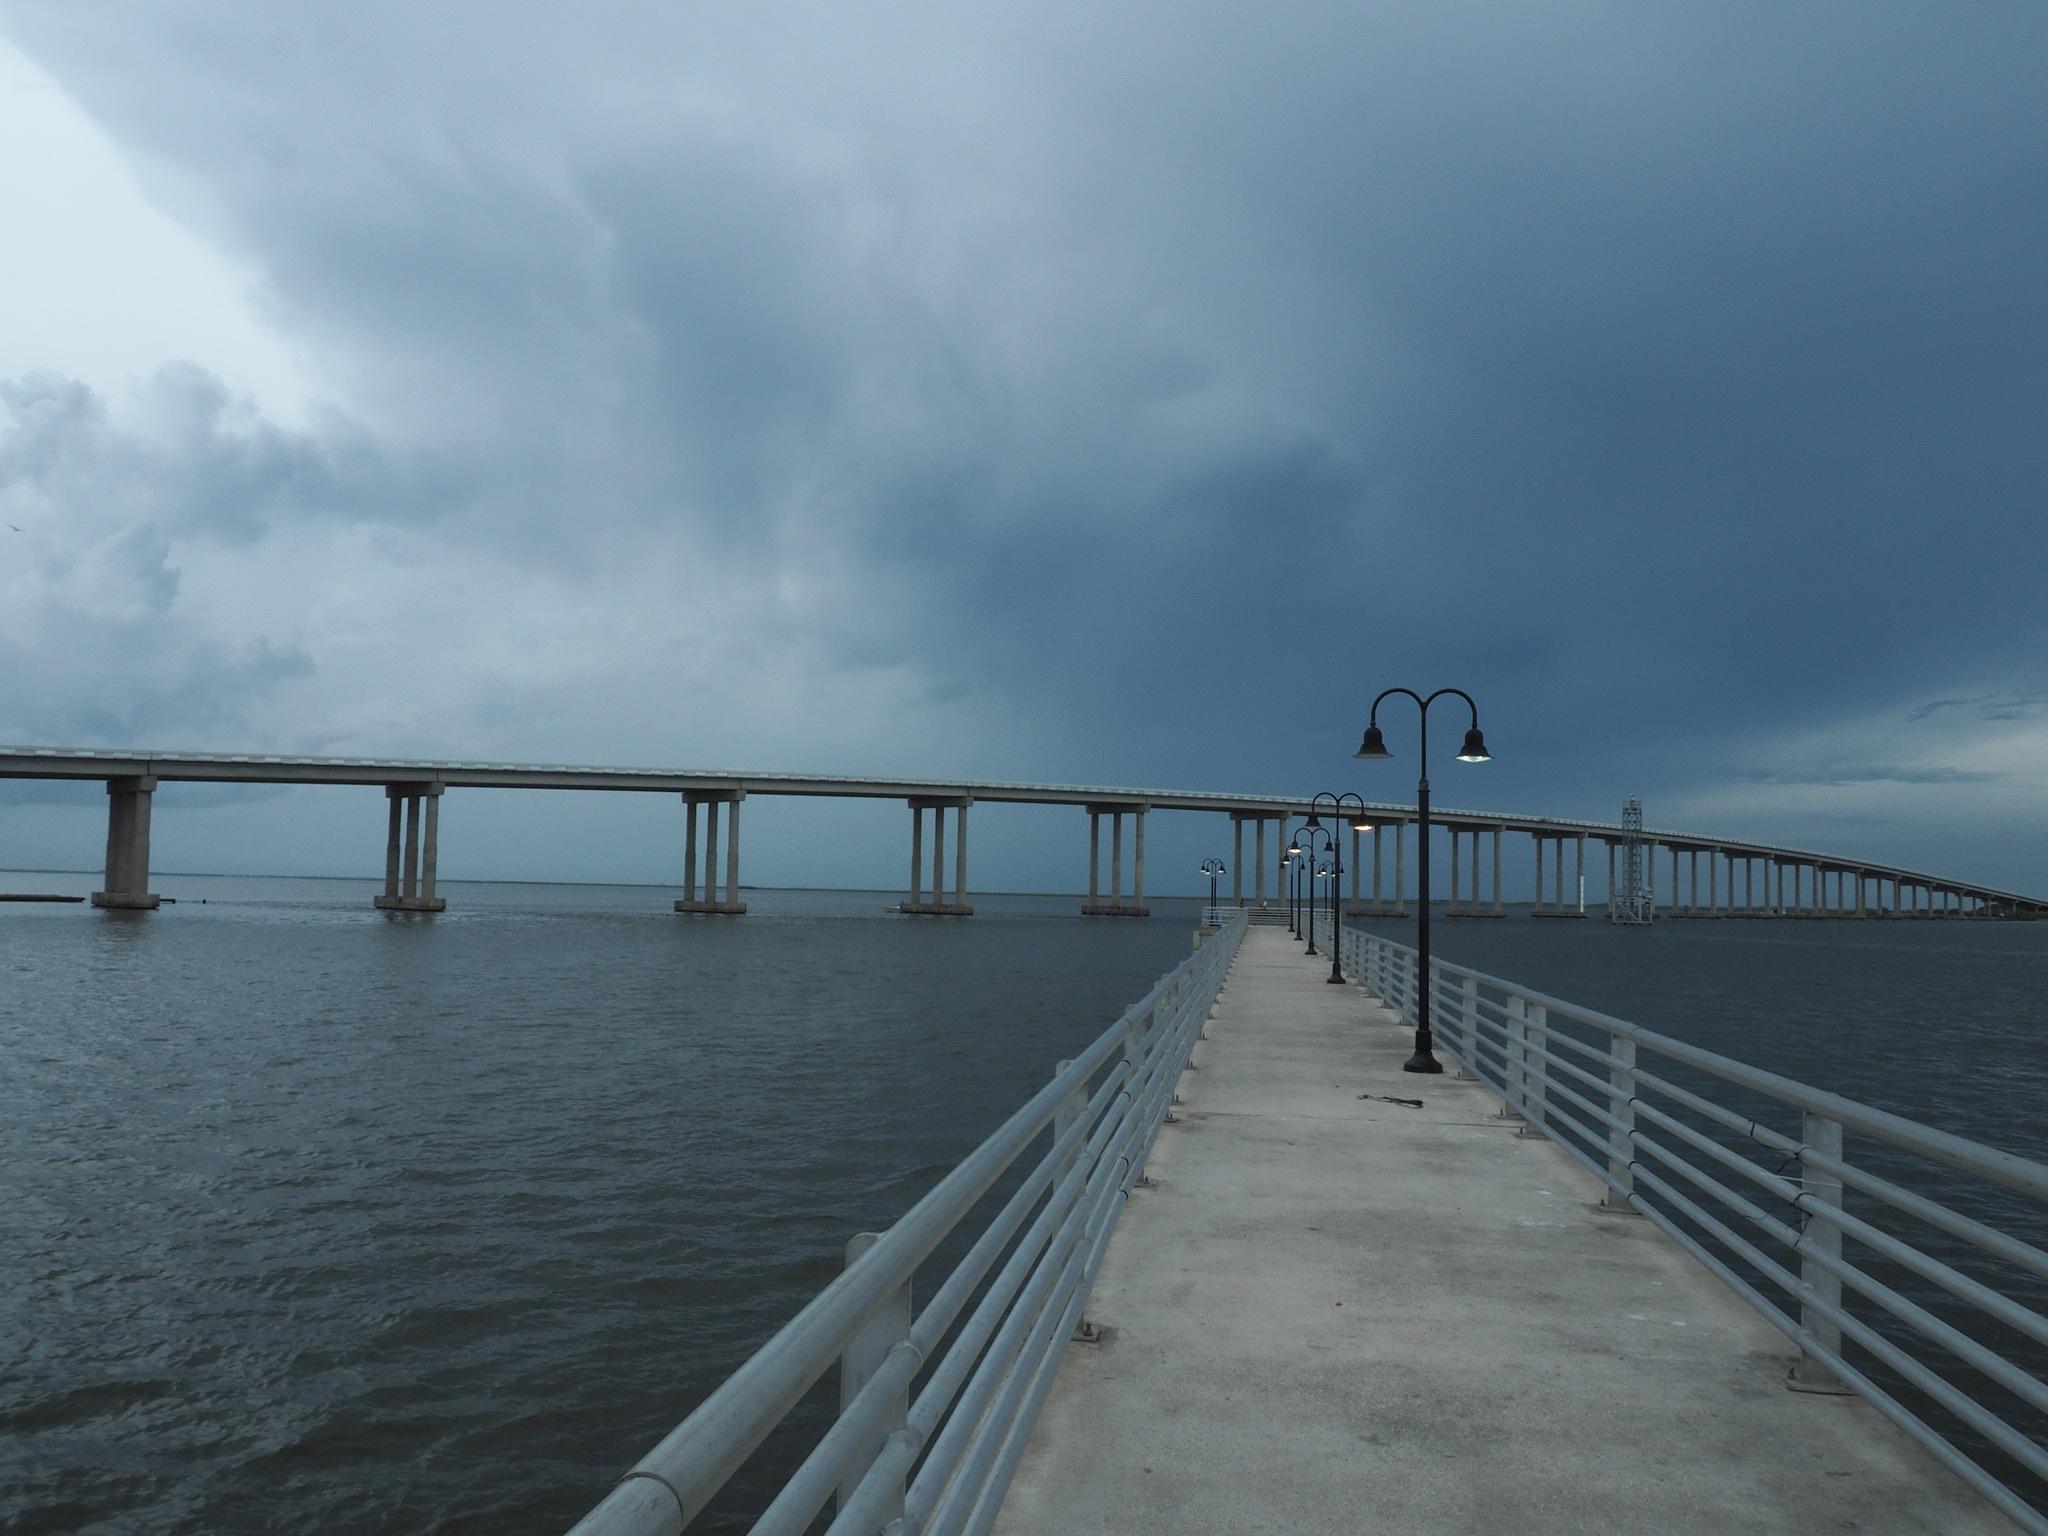 Pier meets Bridge by jerrym